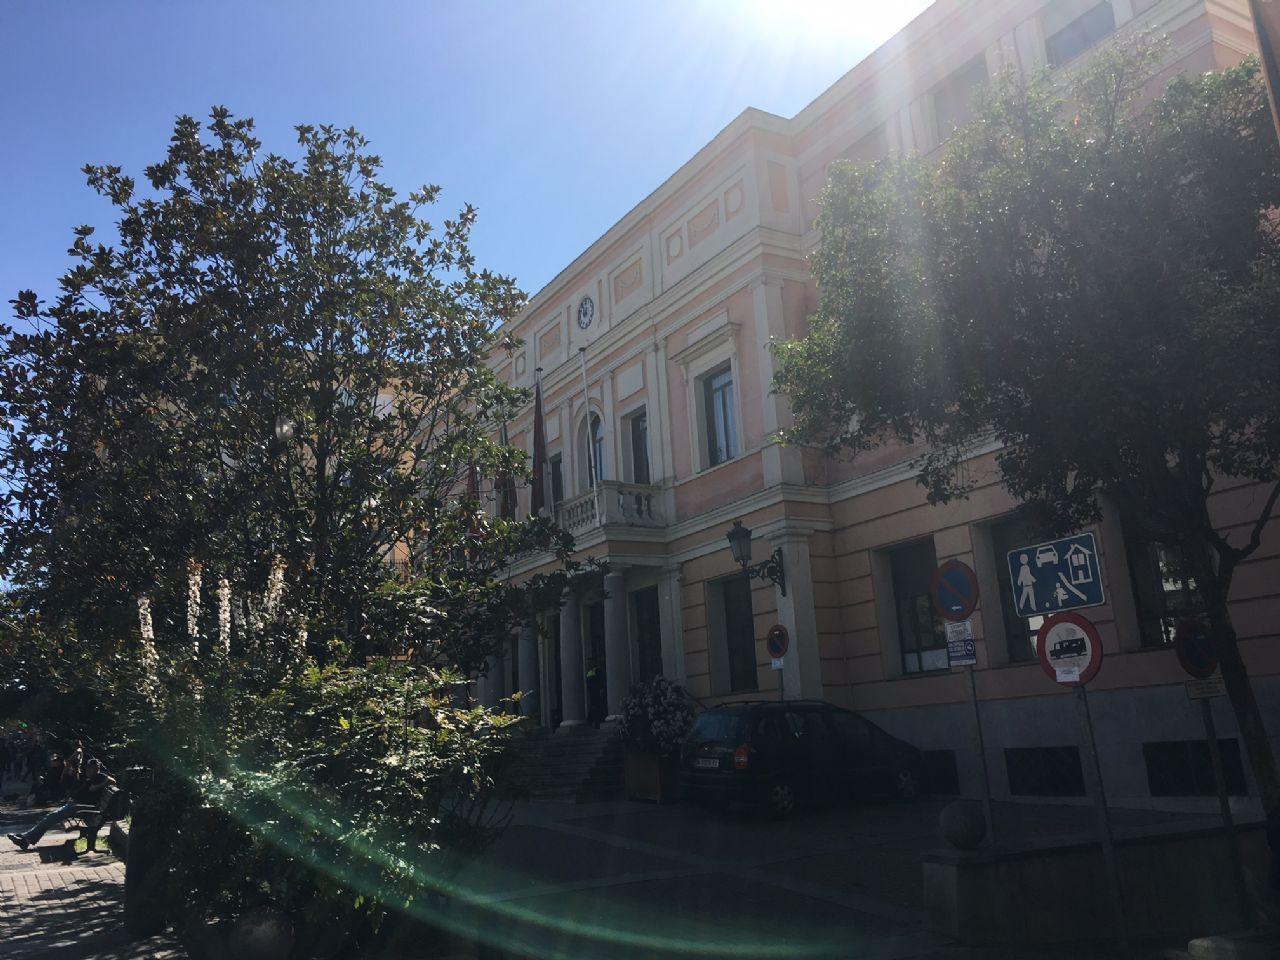 Piso en Madrid, NUMANCIA, venta